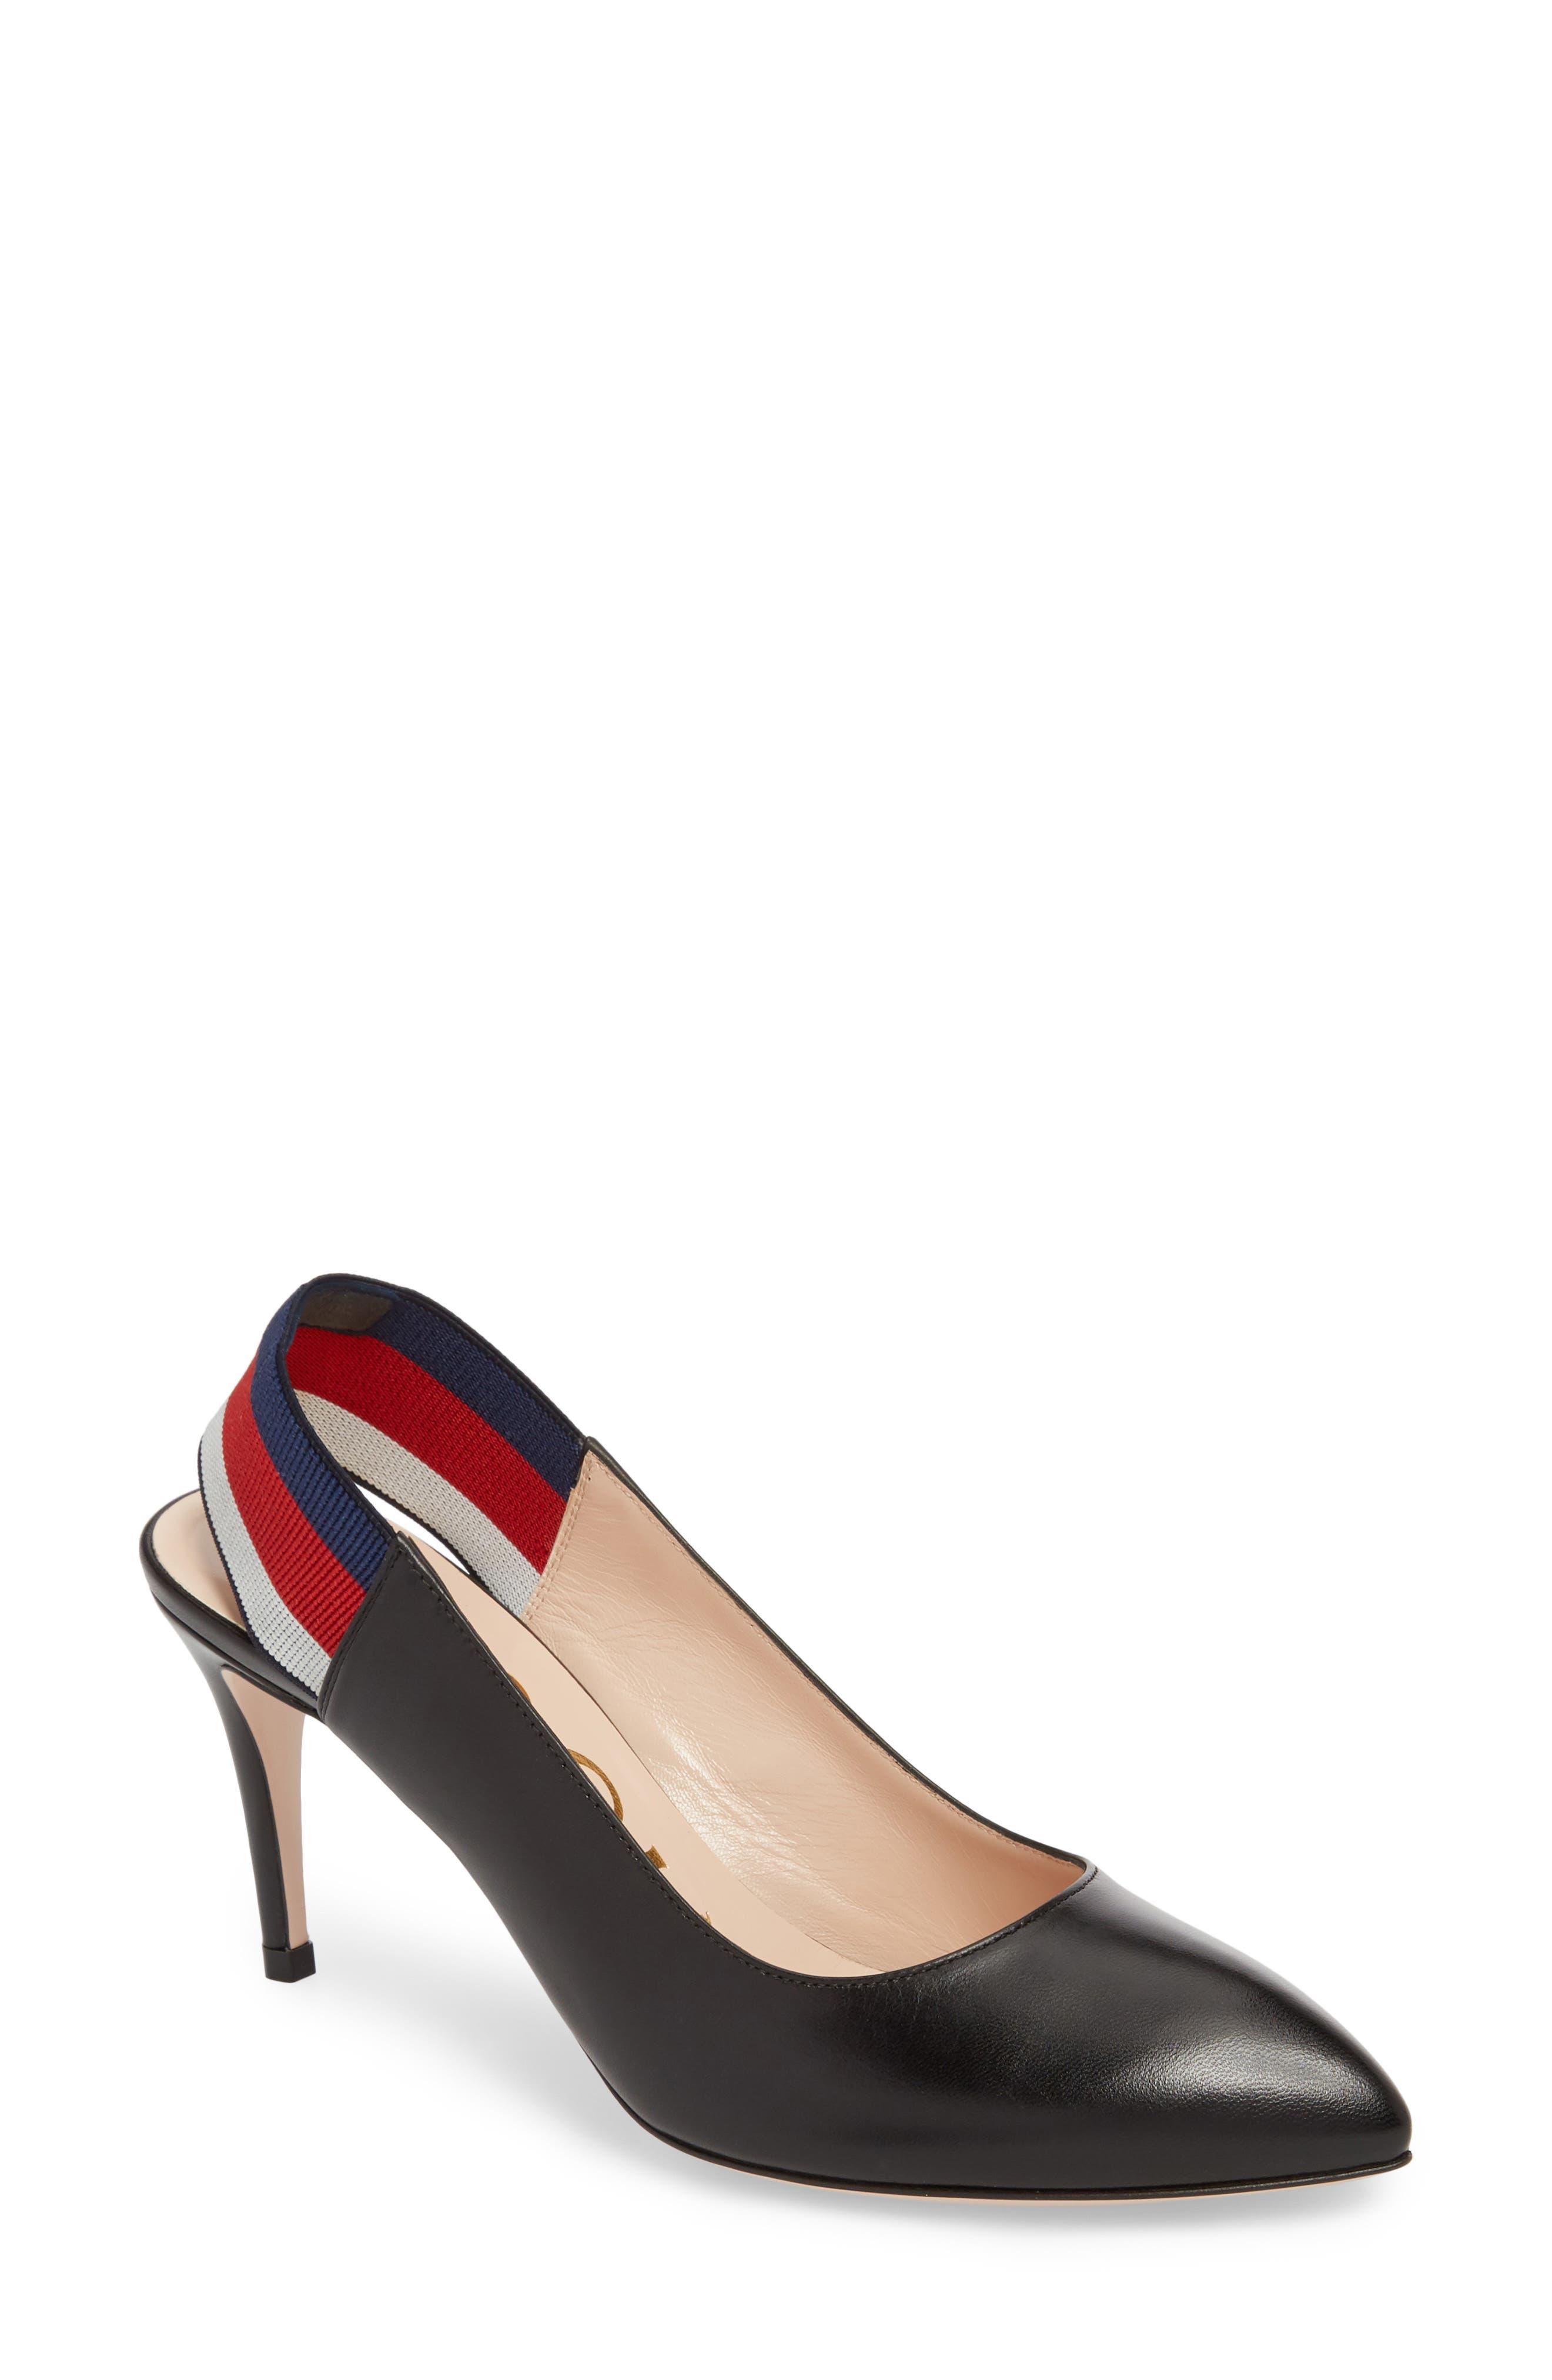 232f383d23 Women's Gucci Heels | Nordstrom